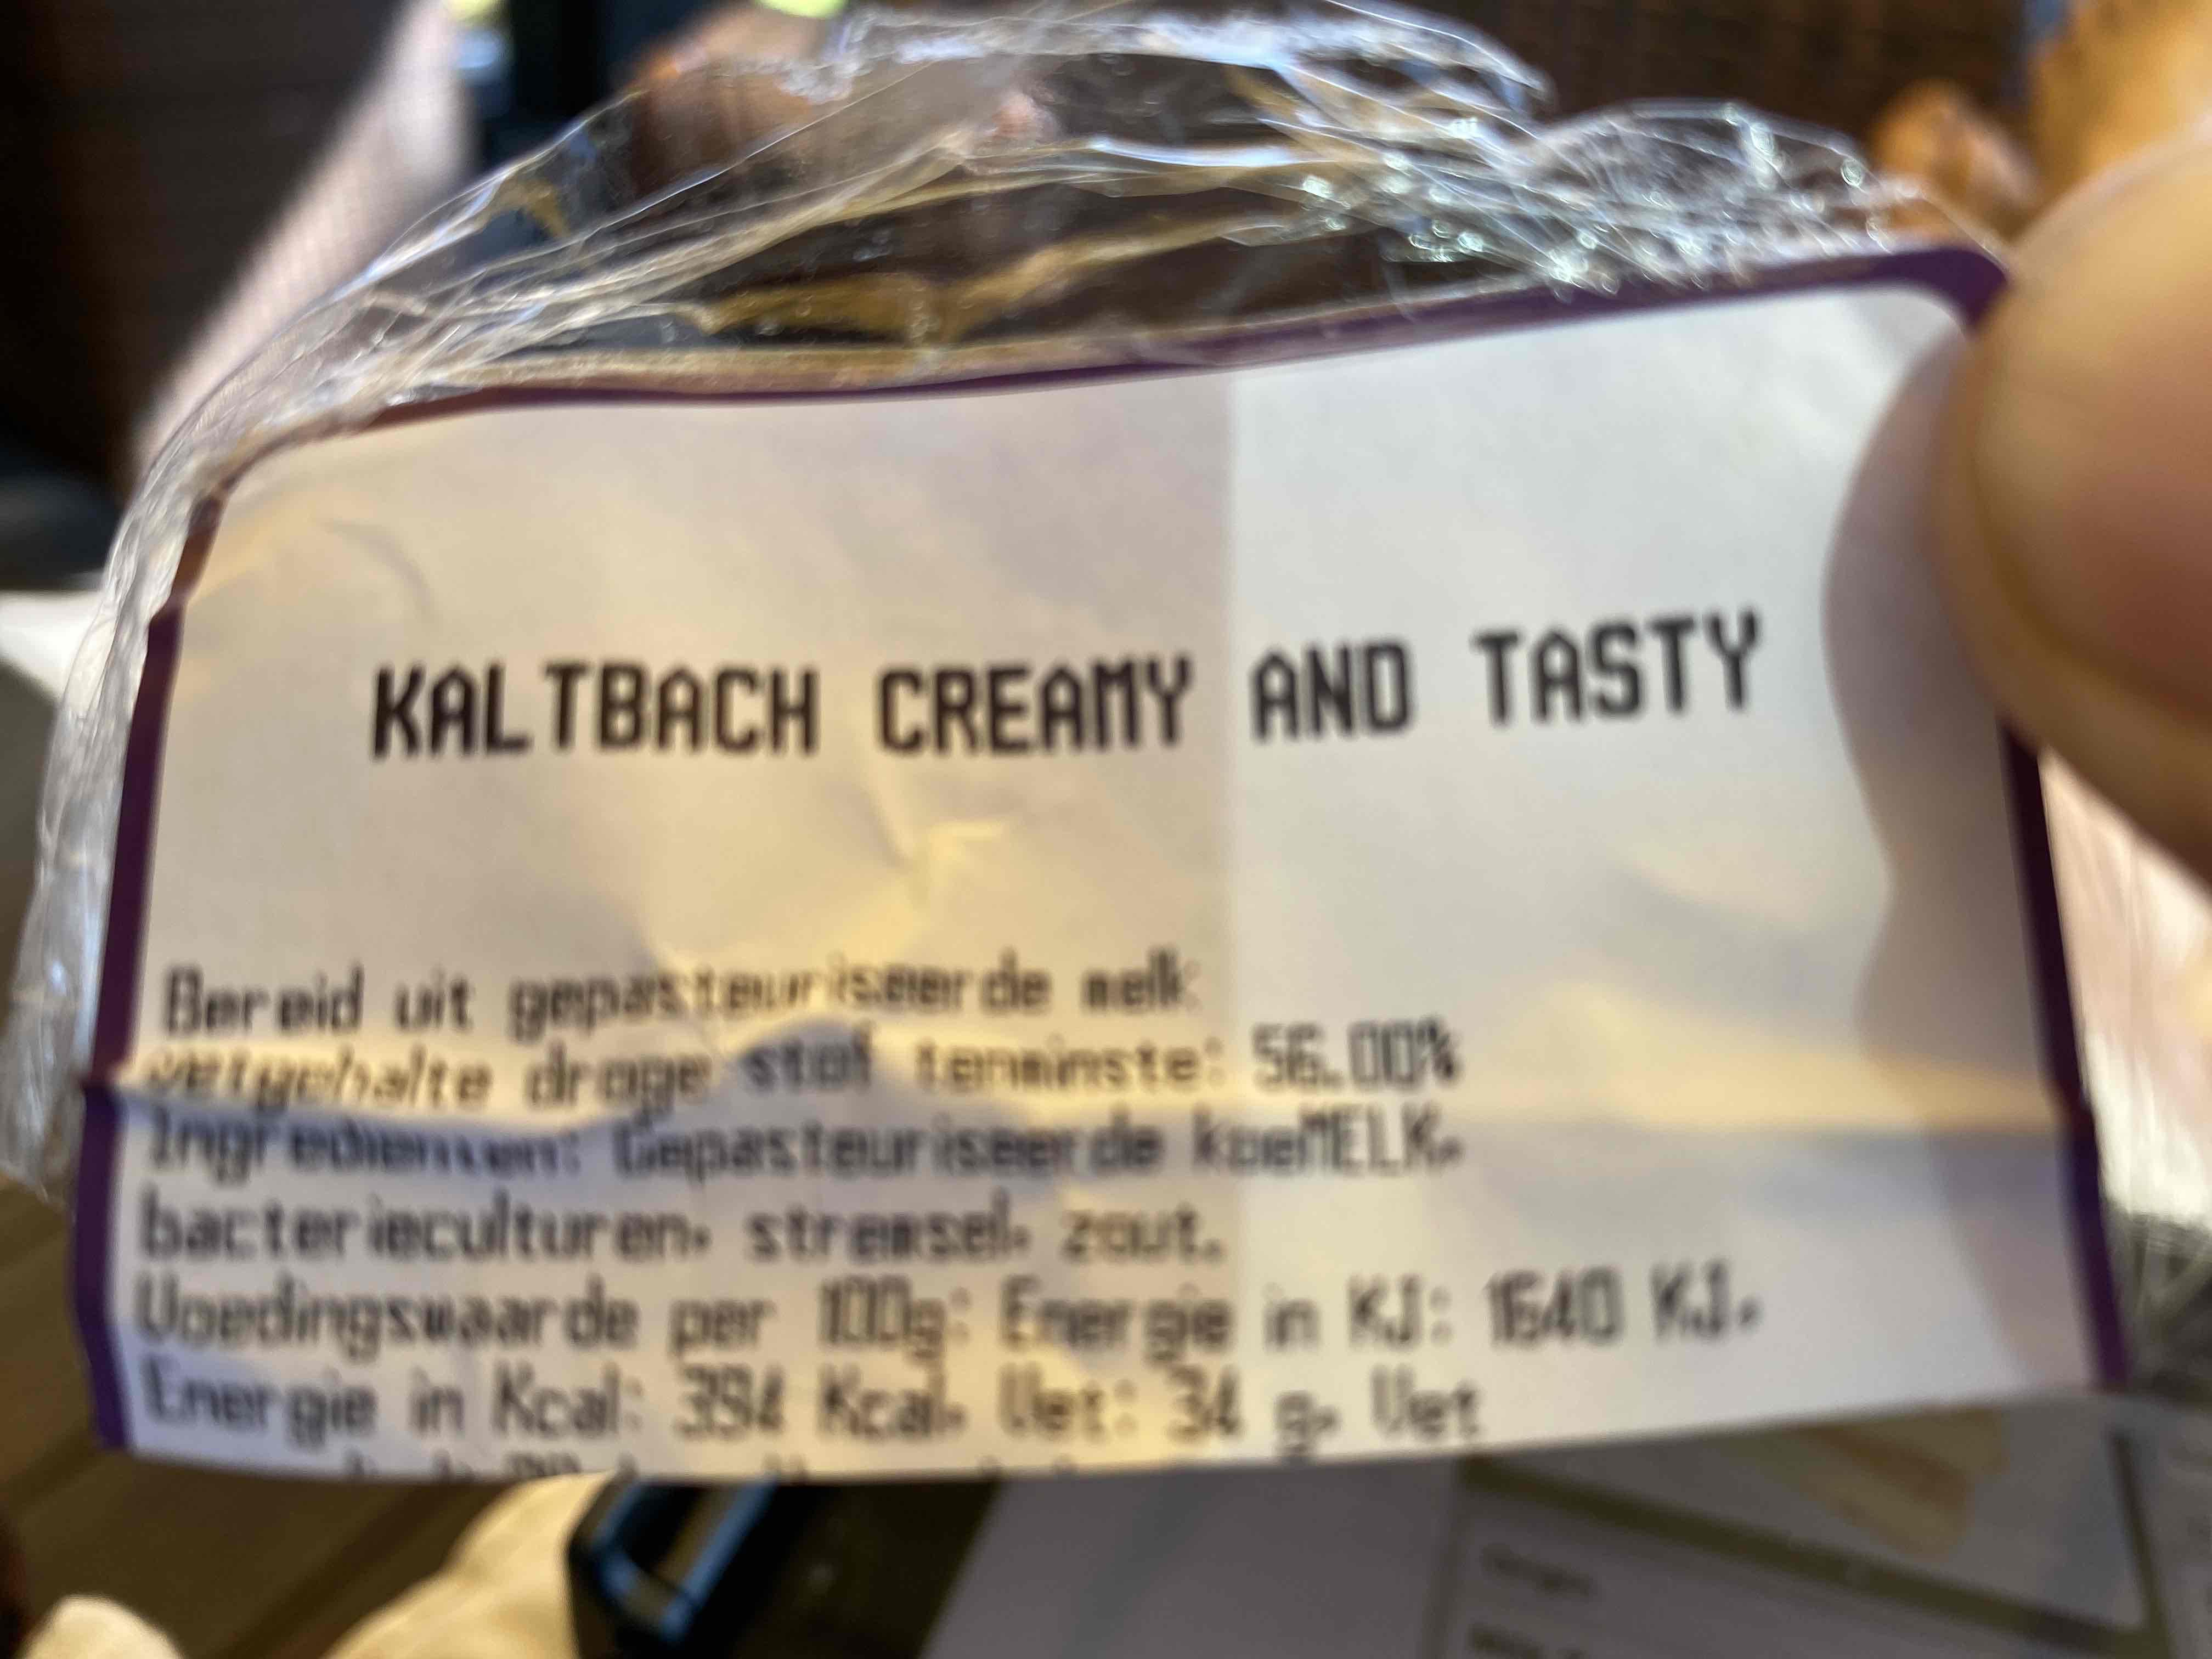 Kaltbach Creamy and Tasty